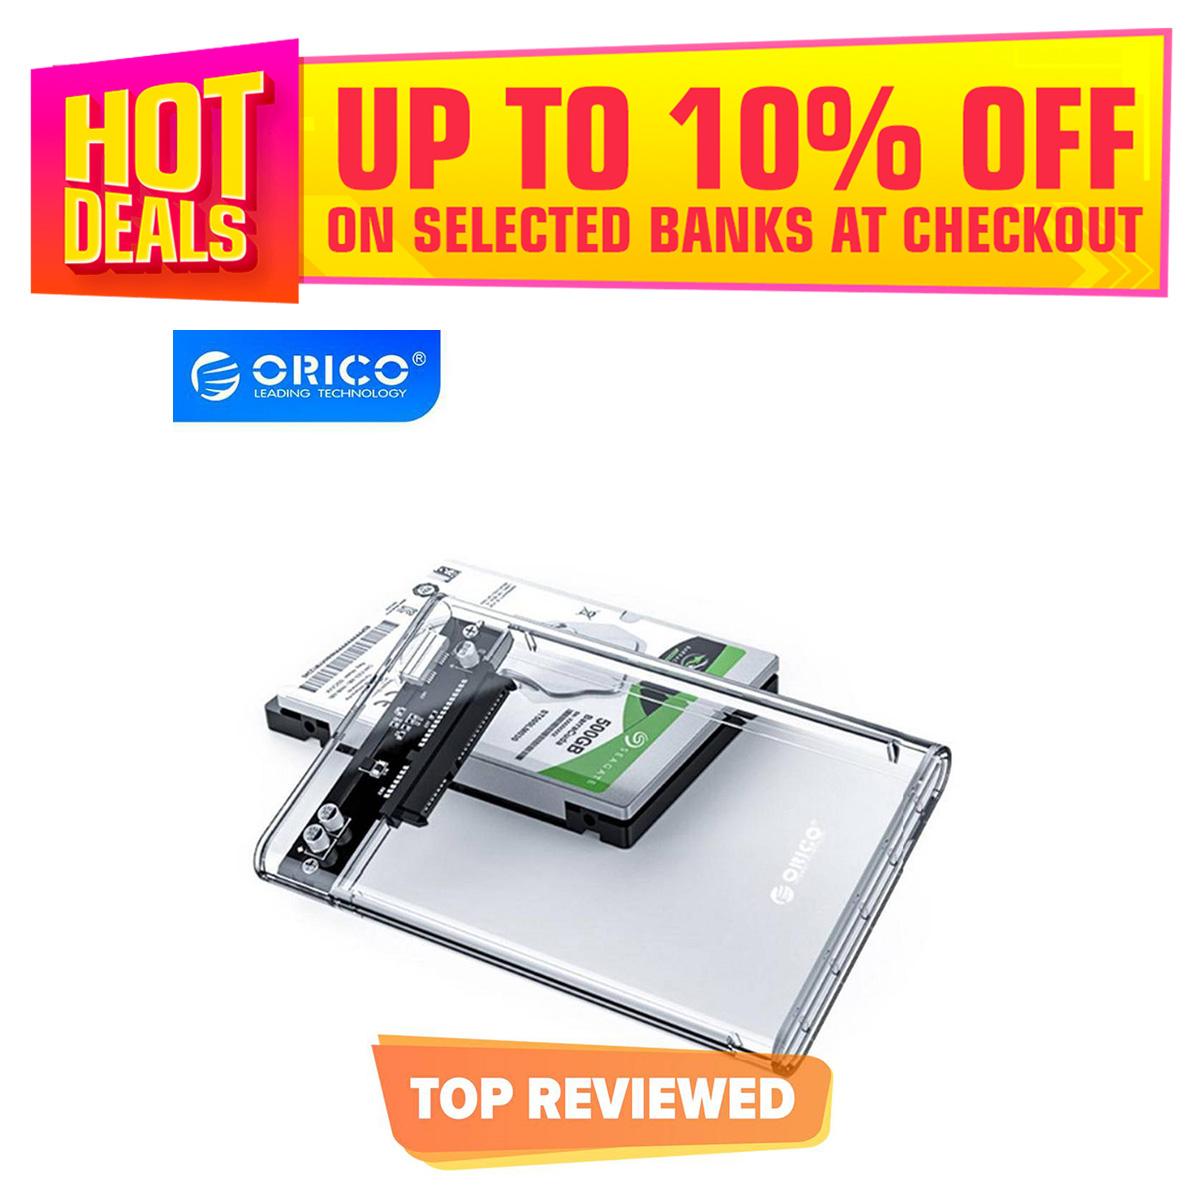 ORICO HDD Case 2.5 Inch Transparent SATA to USB 3.0 External Hard Drive Enclosure